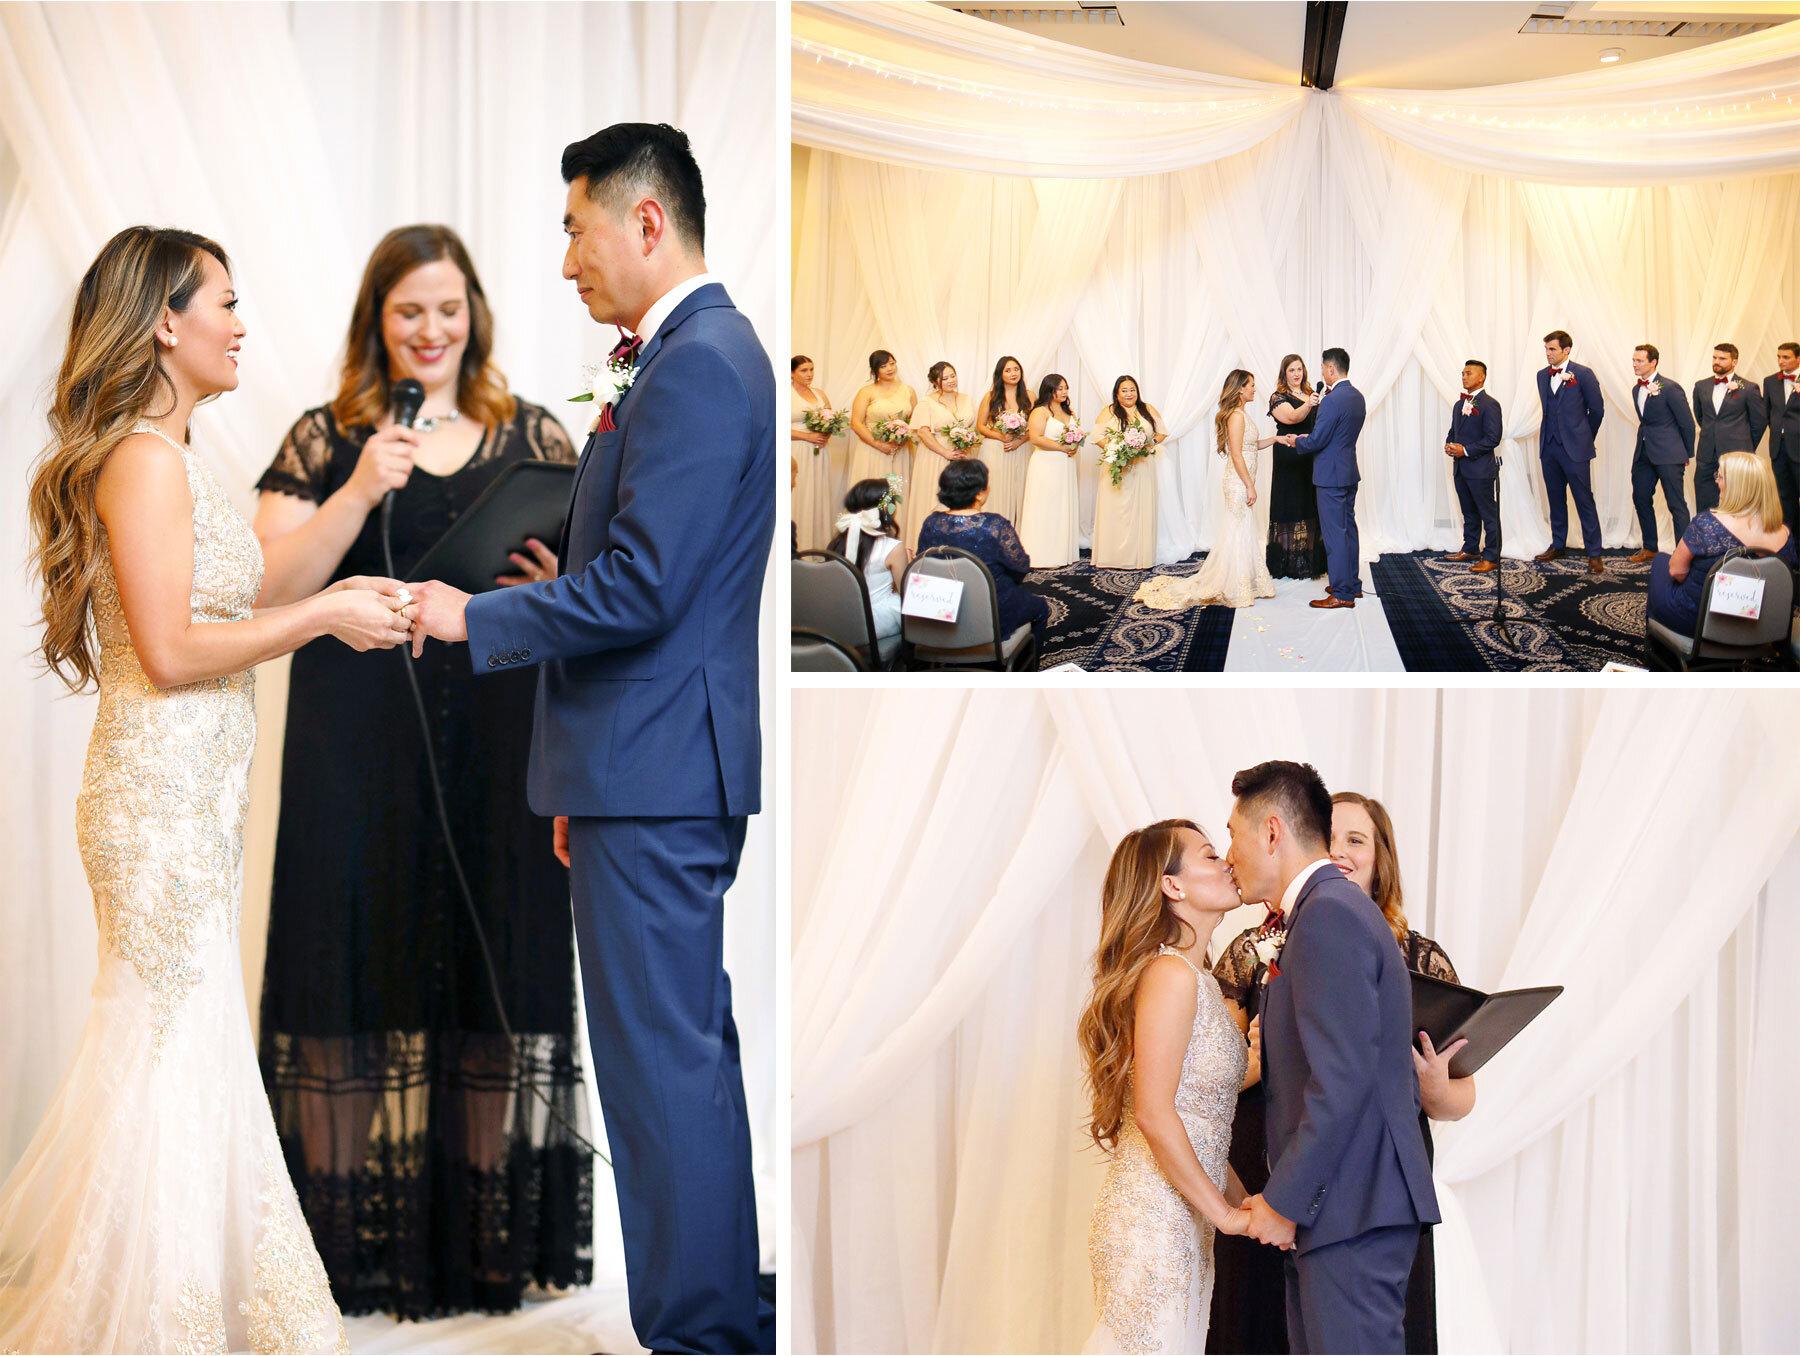 14-Vick-Photography-Minneapolis-Minnesota-The-Graduate-Hotel-Ceremony-Bride-Groom-Kiss-Mai-&-Ross.jpg